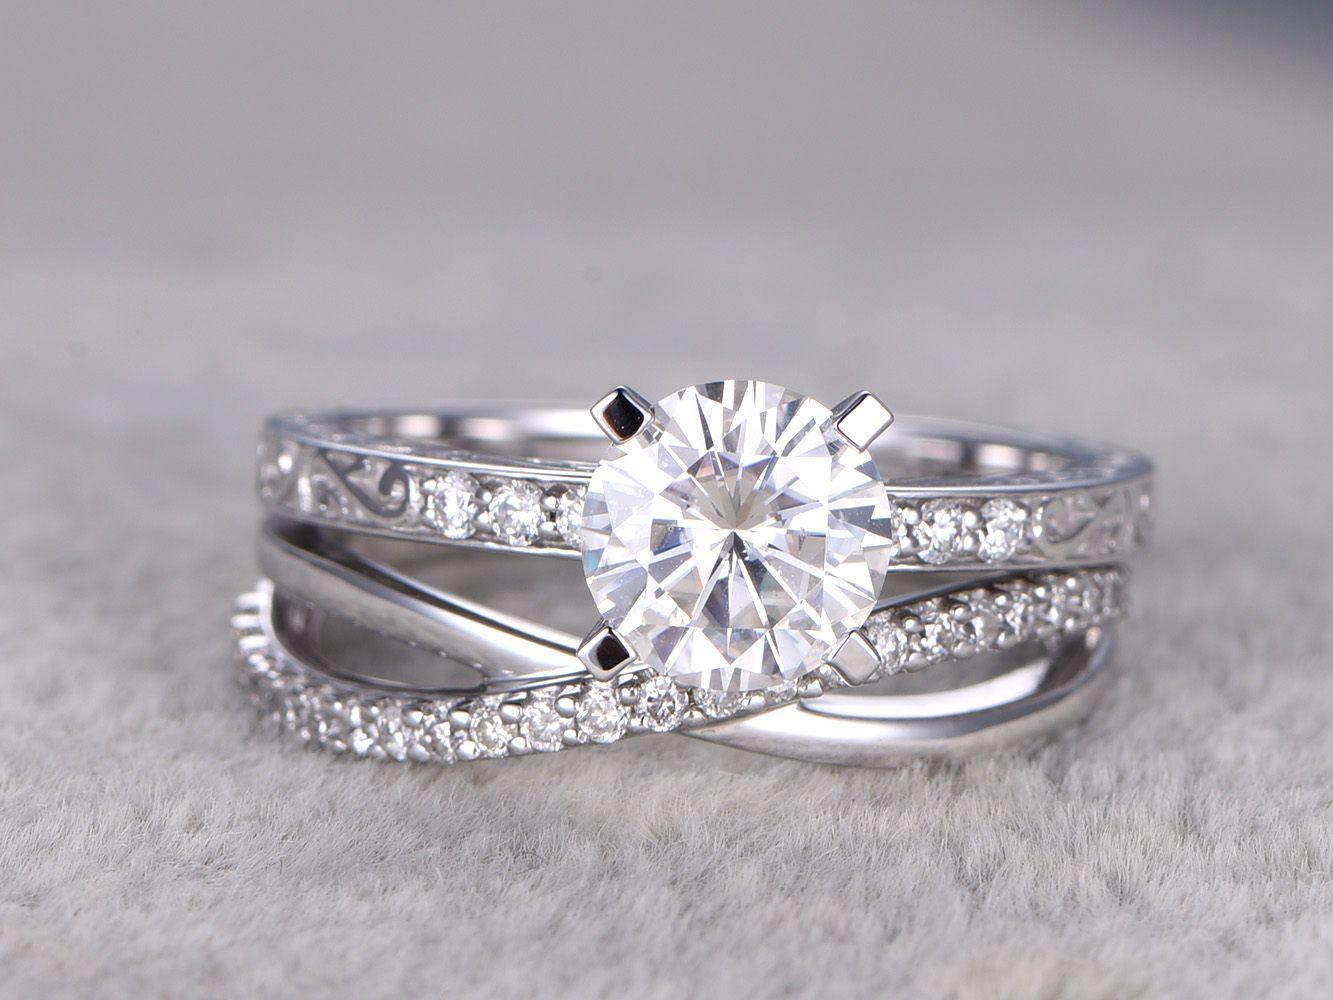 2 Moissanite Bridal Set Solitaire Engagement Ring Criss Cross